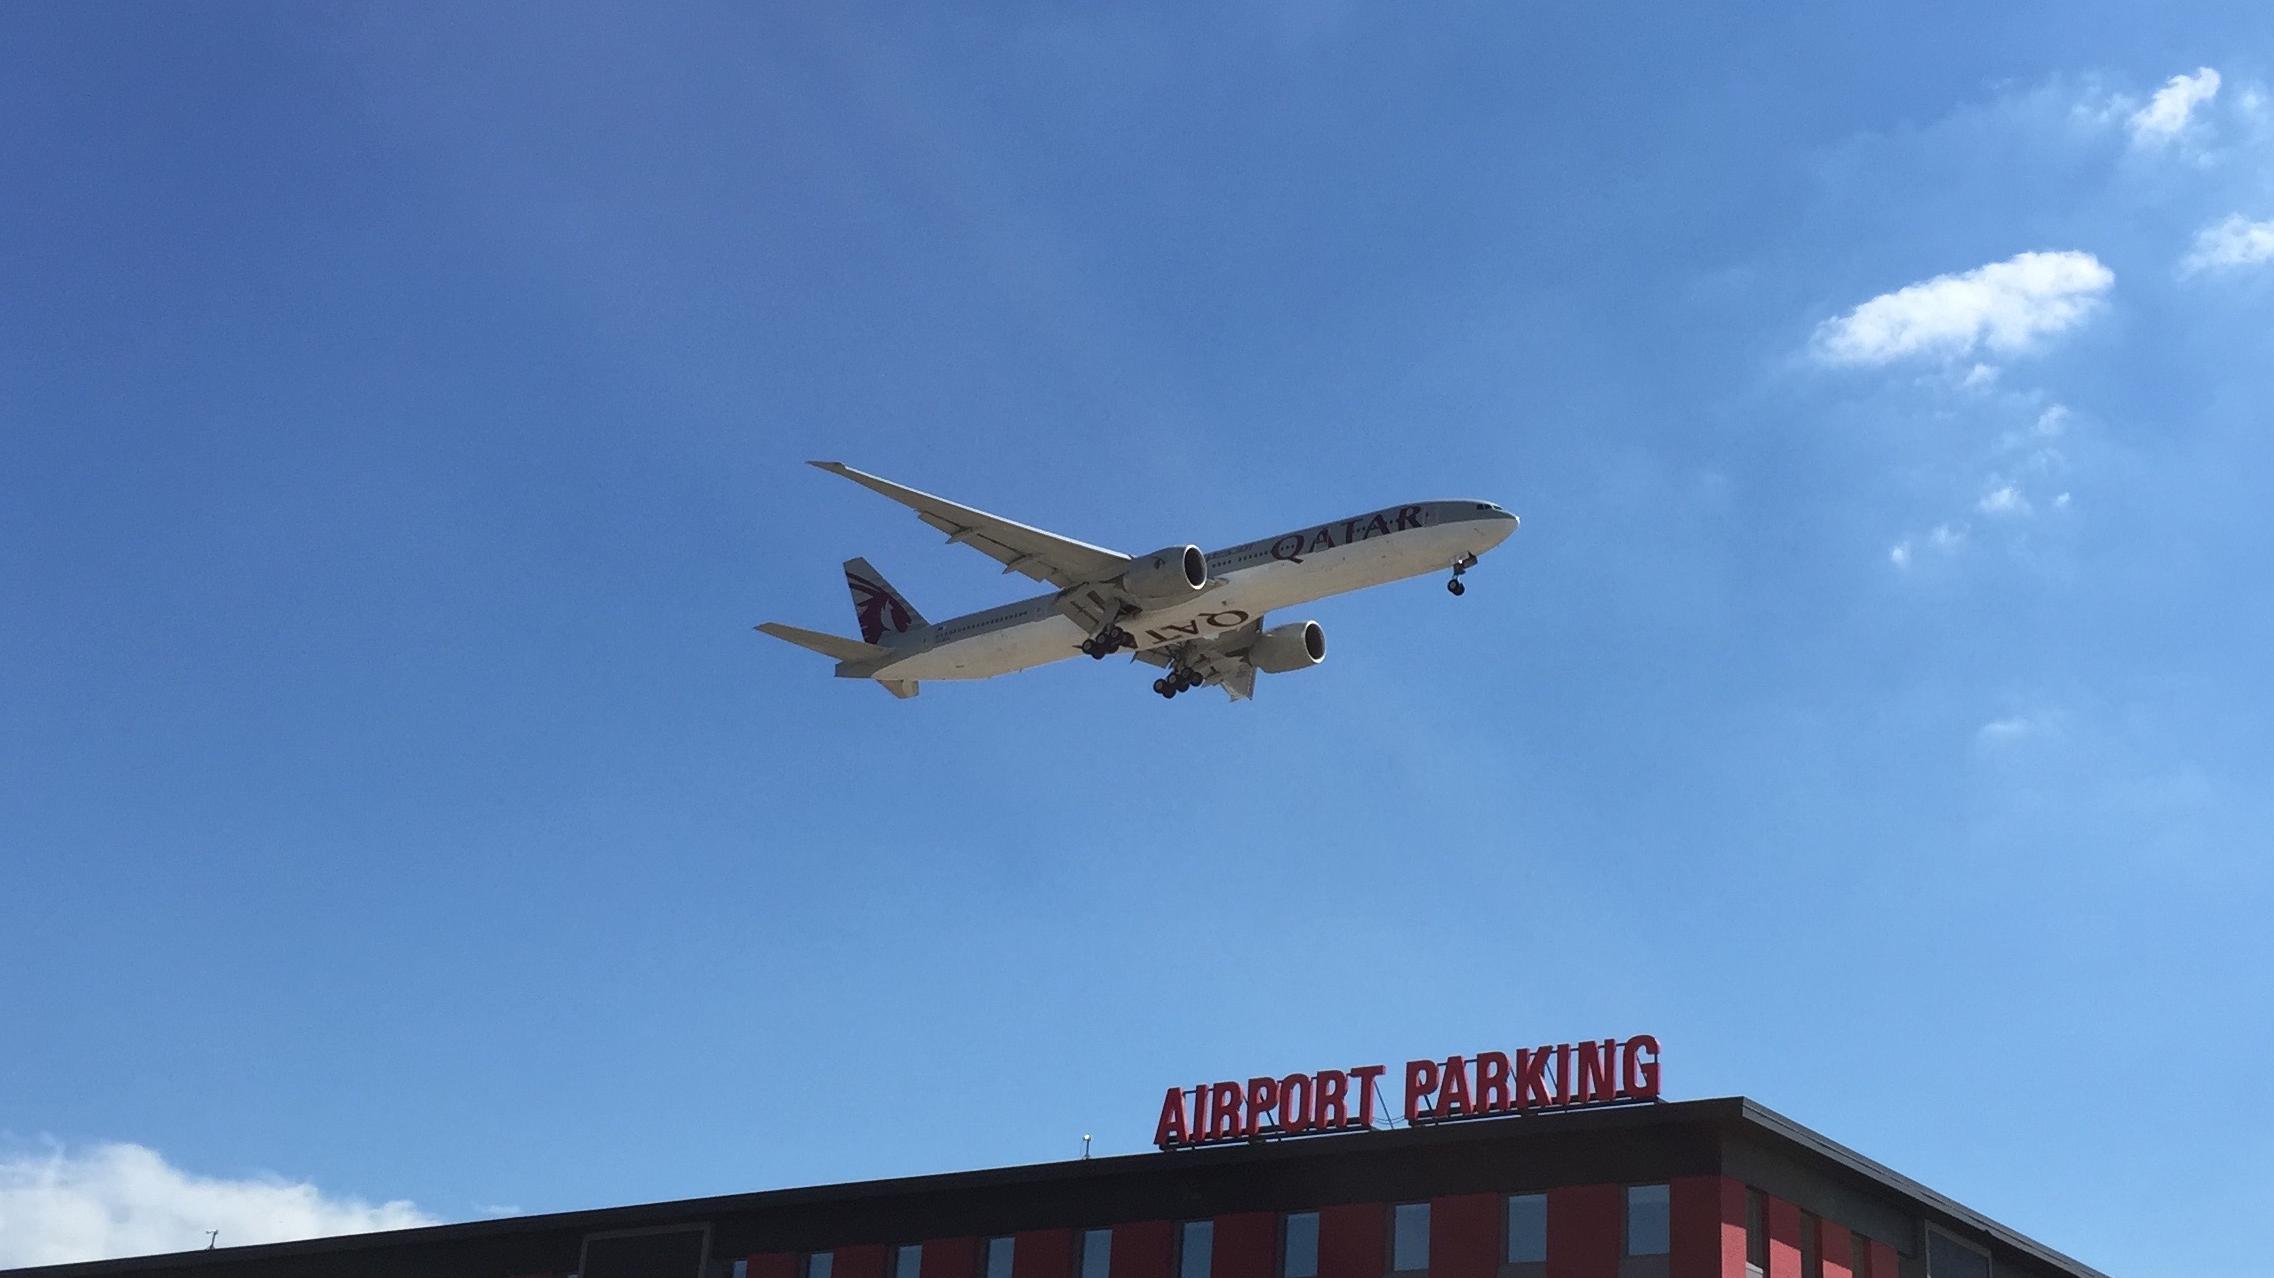 Qatar Airways Boeing 777-300 arriving from Doha